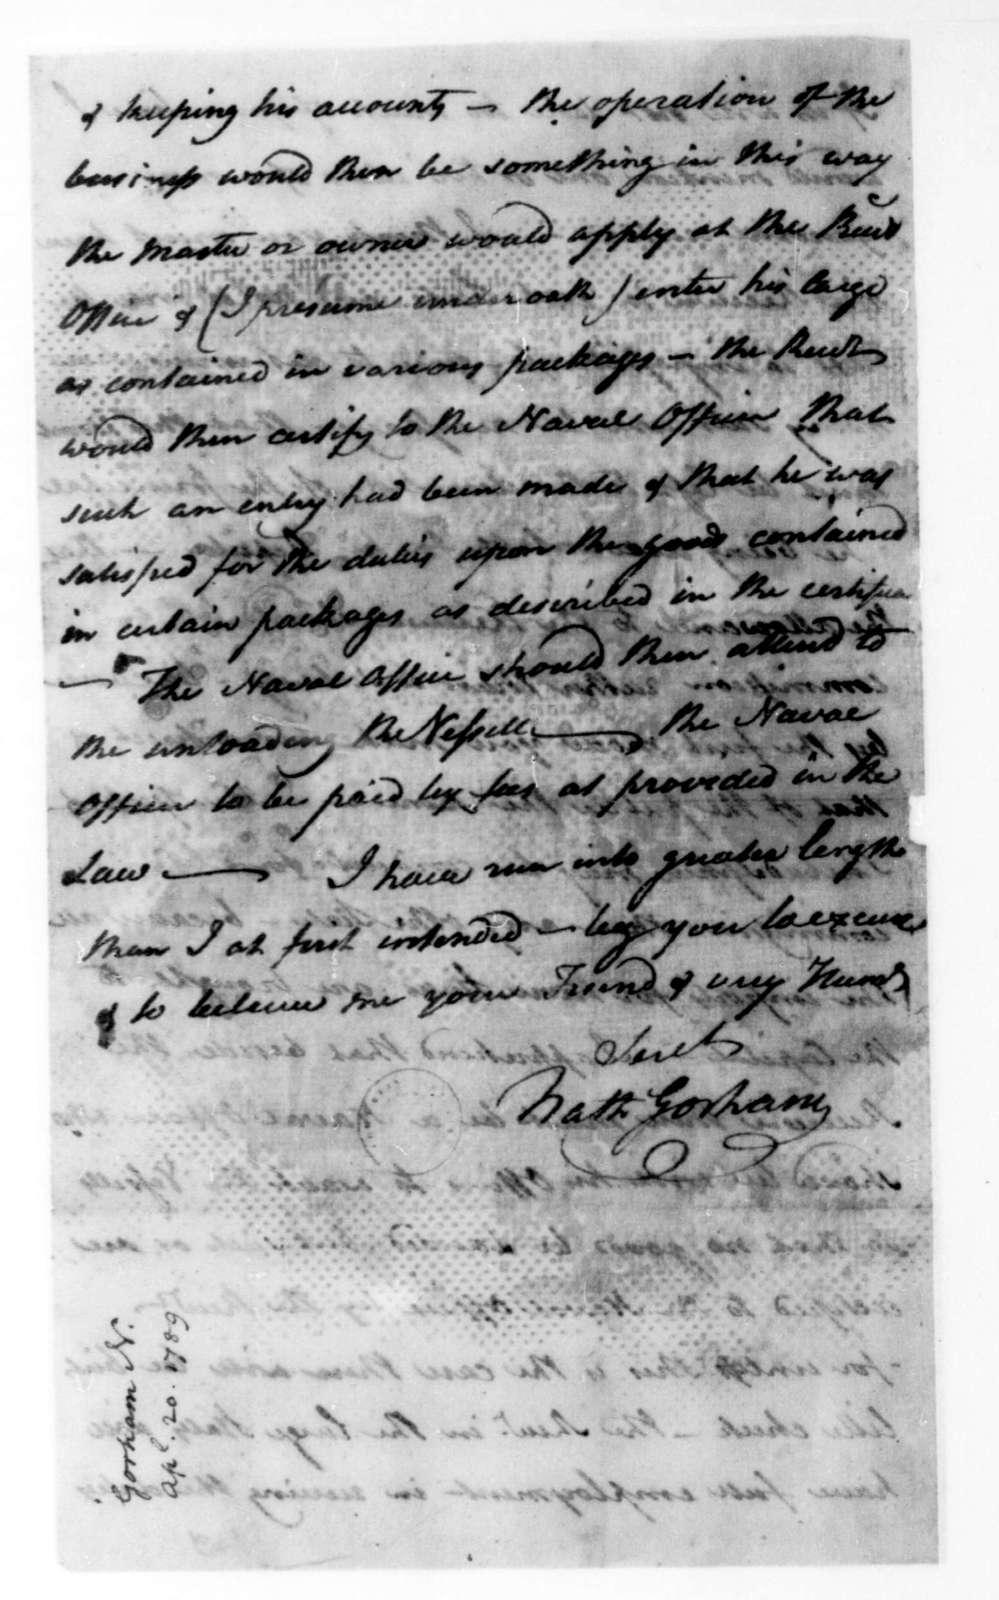 Nathaniel Gorham to James Madison, April 20, 1789.